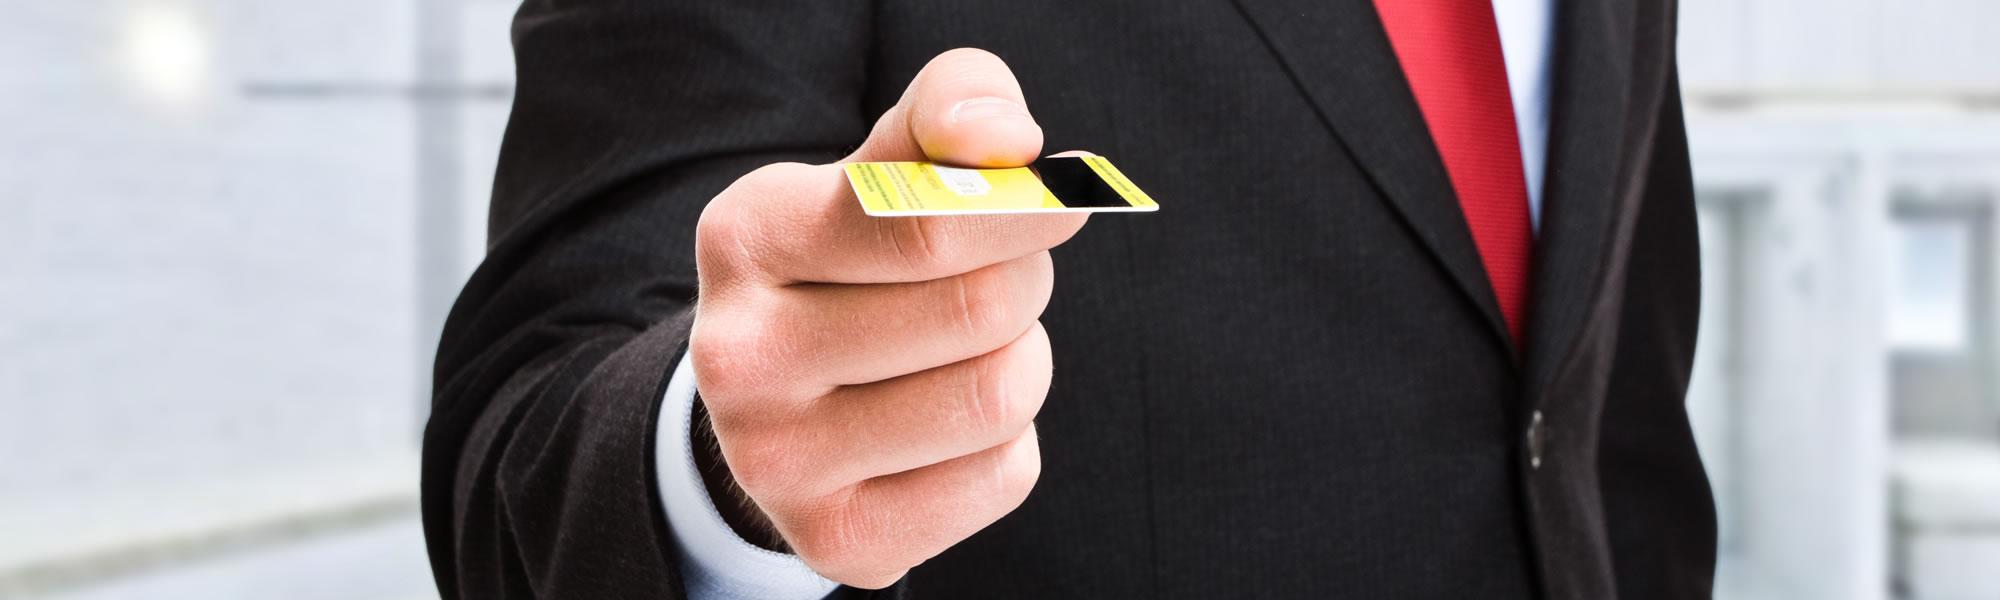 Rewards Mastercard Header Image